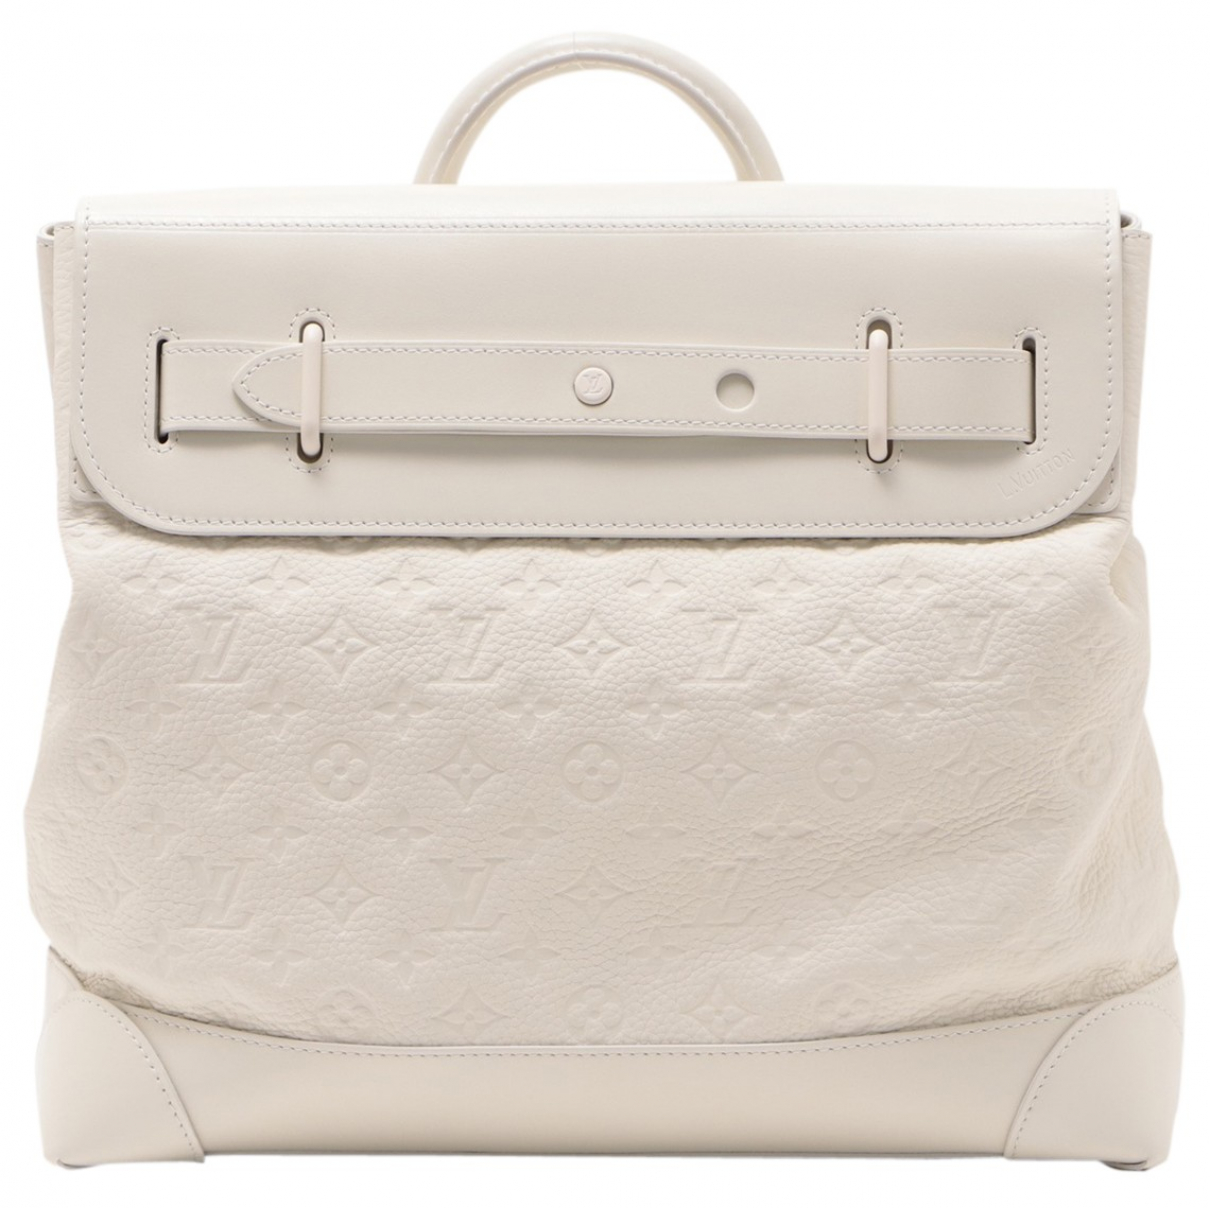 Louis Vuitton - Sac a main City Steamer pour femme en toile - blanc